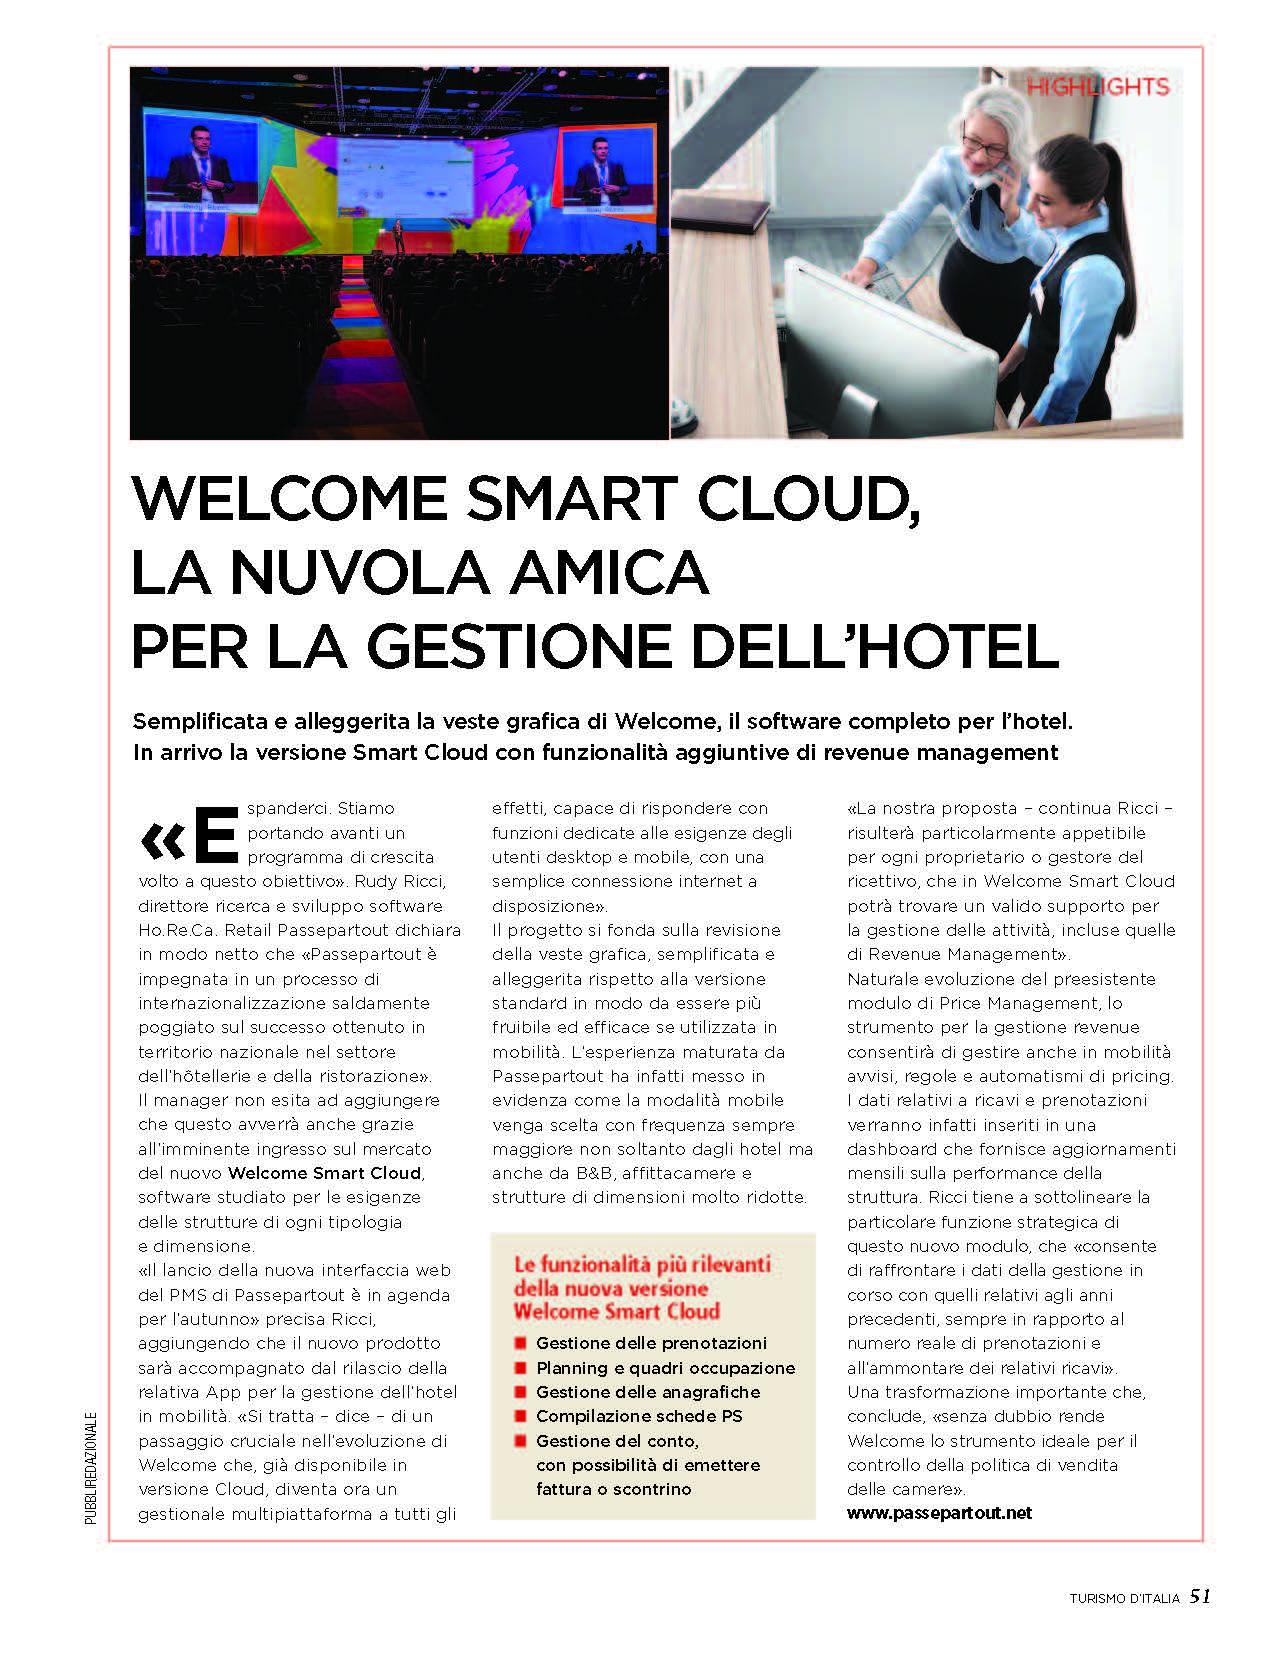 TURISMO D'ITALIA - WELCOME SMART CLOUD